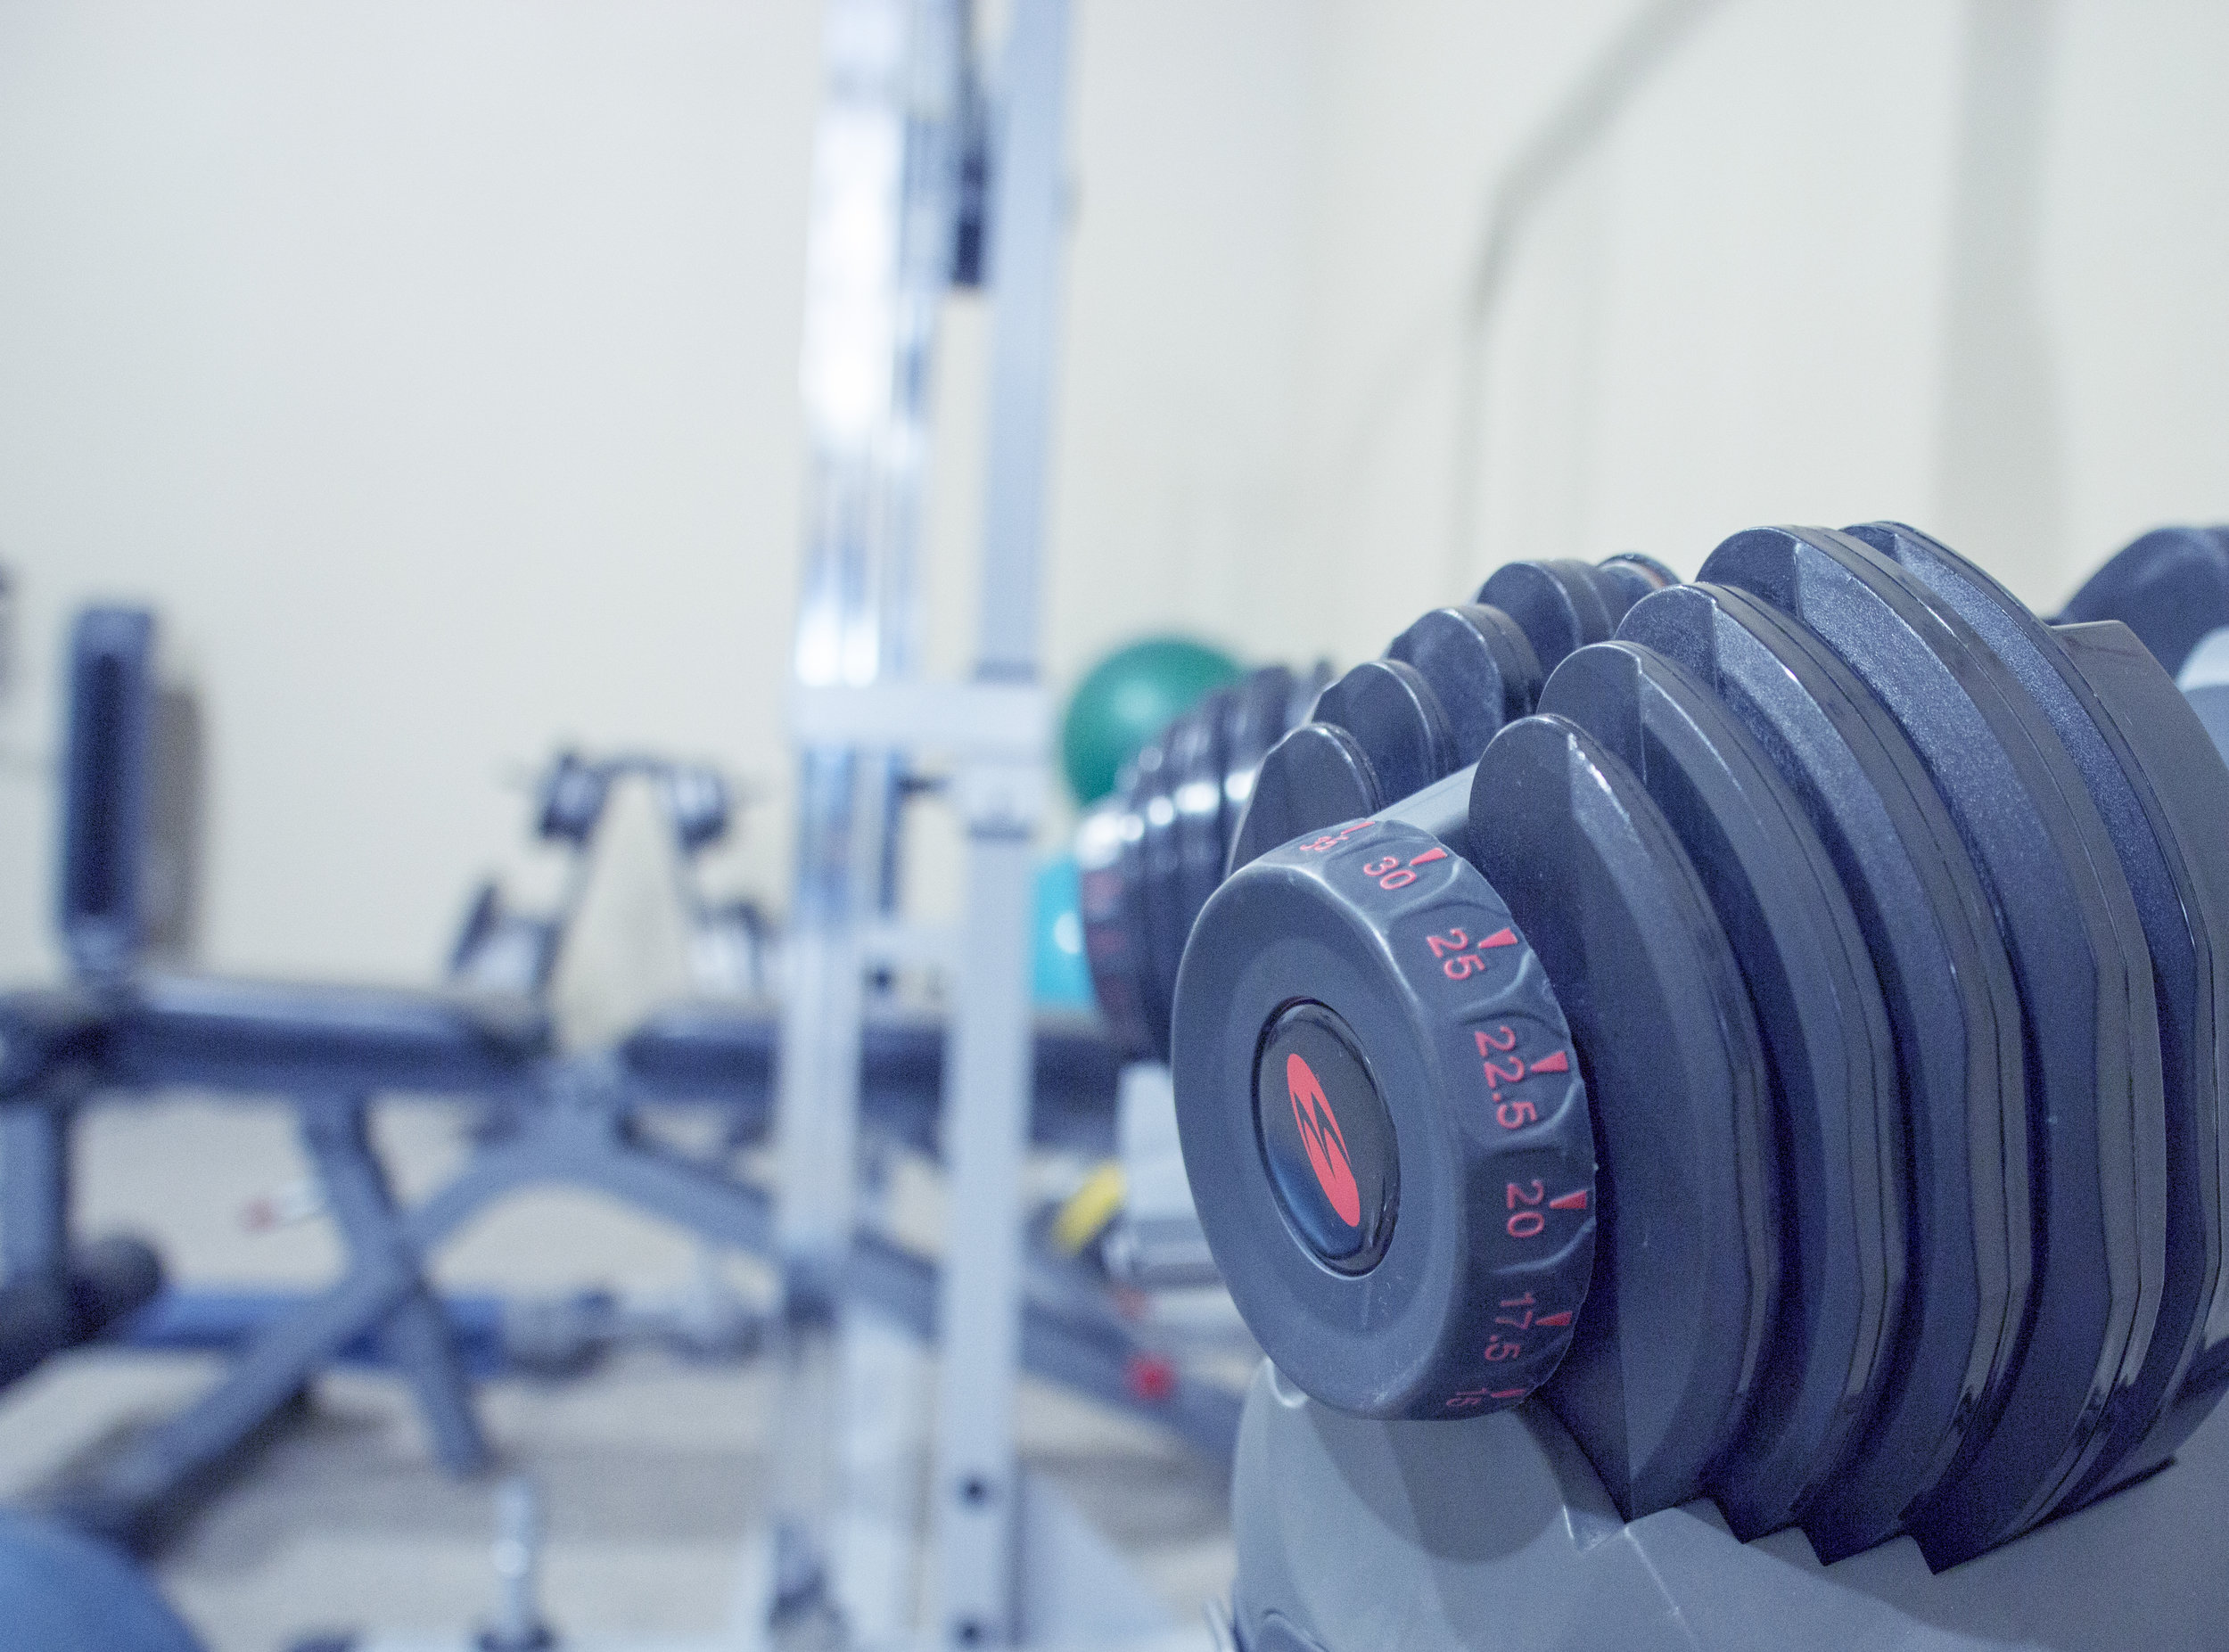 Western Trails Health and Wellness Fitness-.jpg